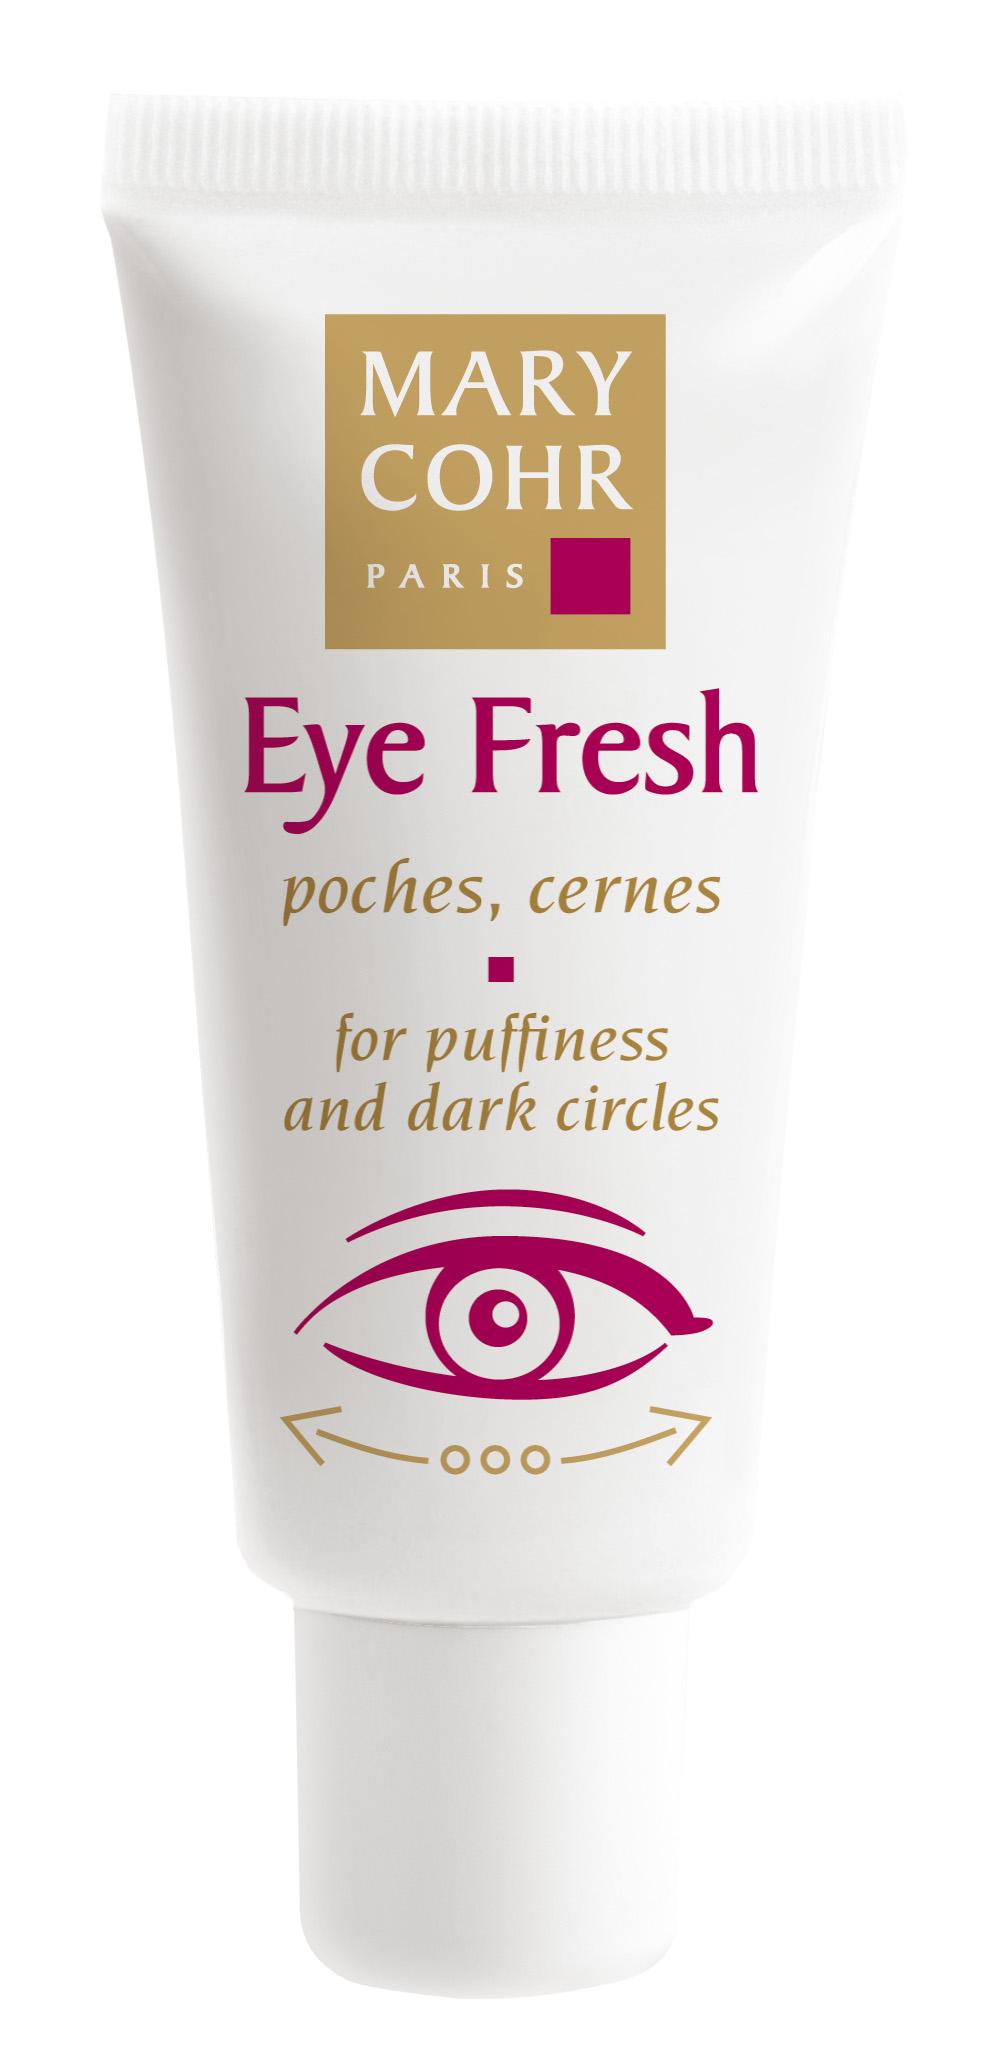 3.Гель-атистресс Eye Fresh